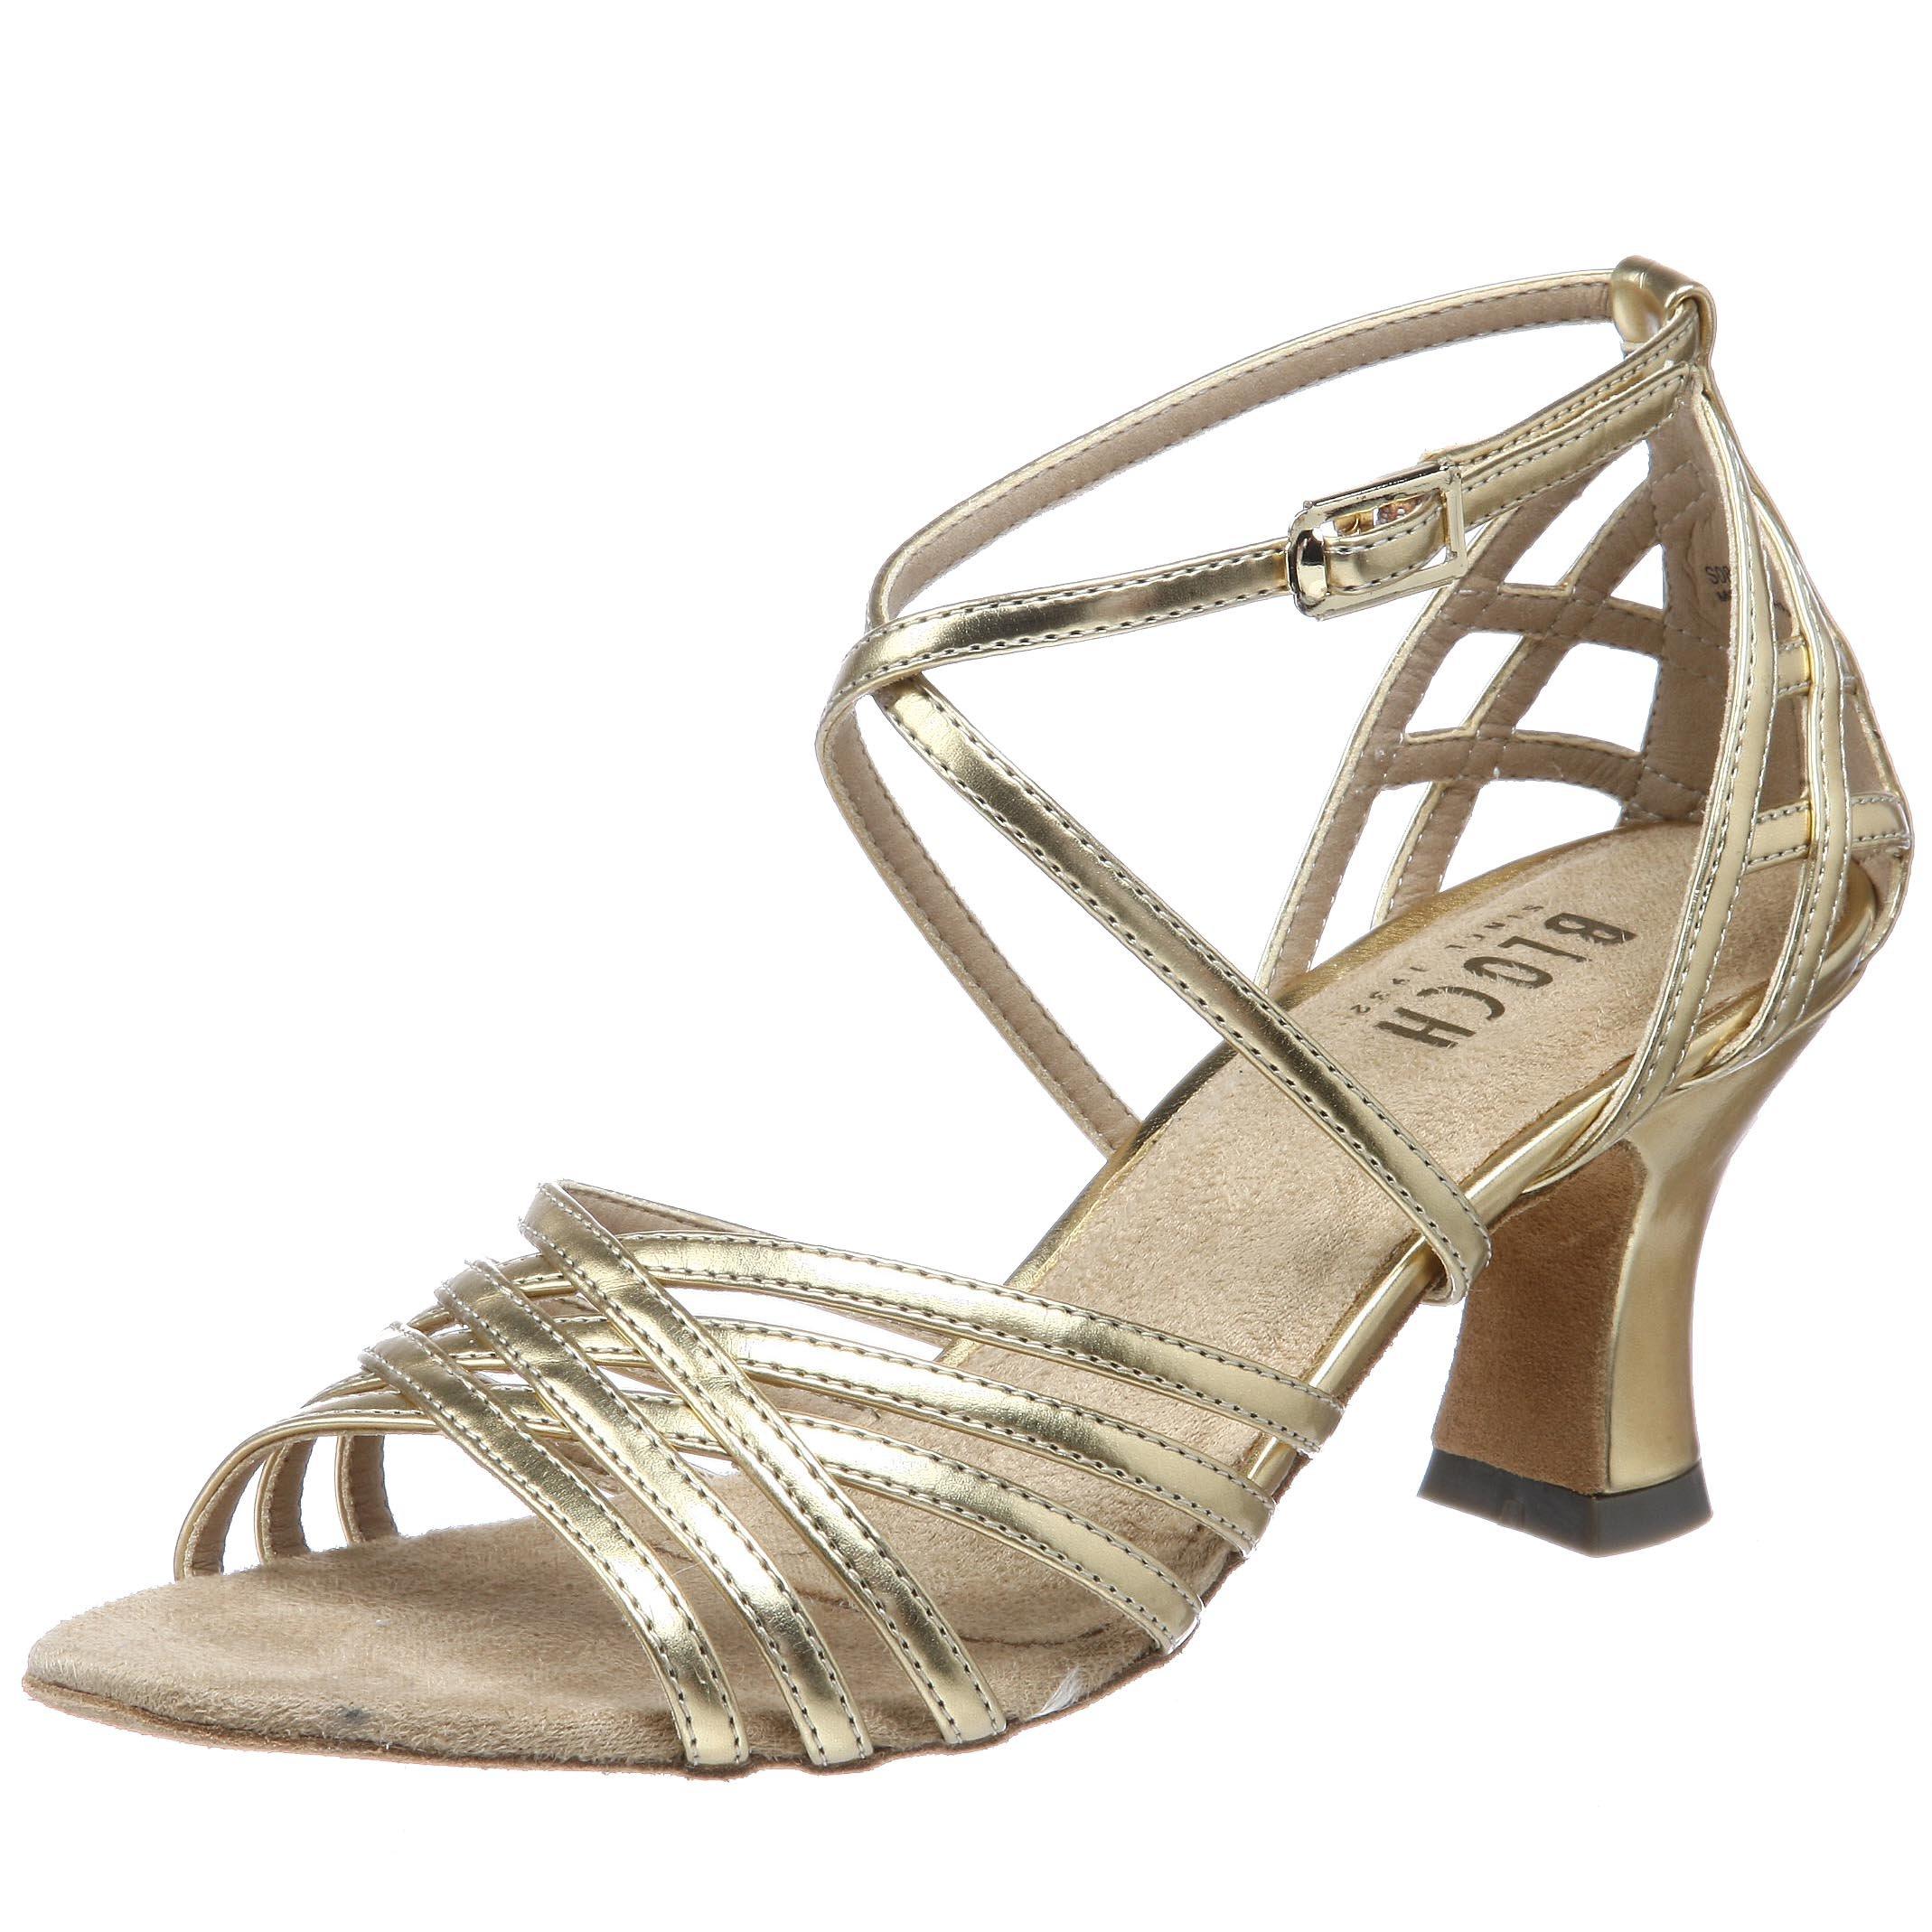 Bloch Dance Women's Yvette Ballroom Shoe,Gold,7.5 M US